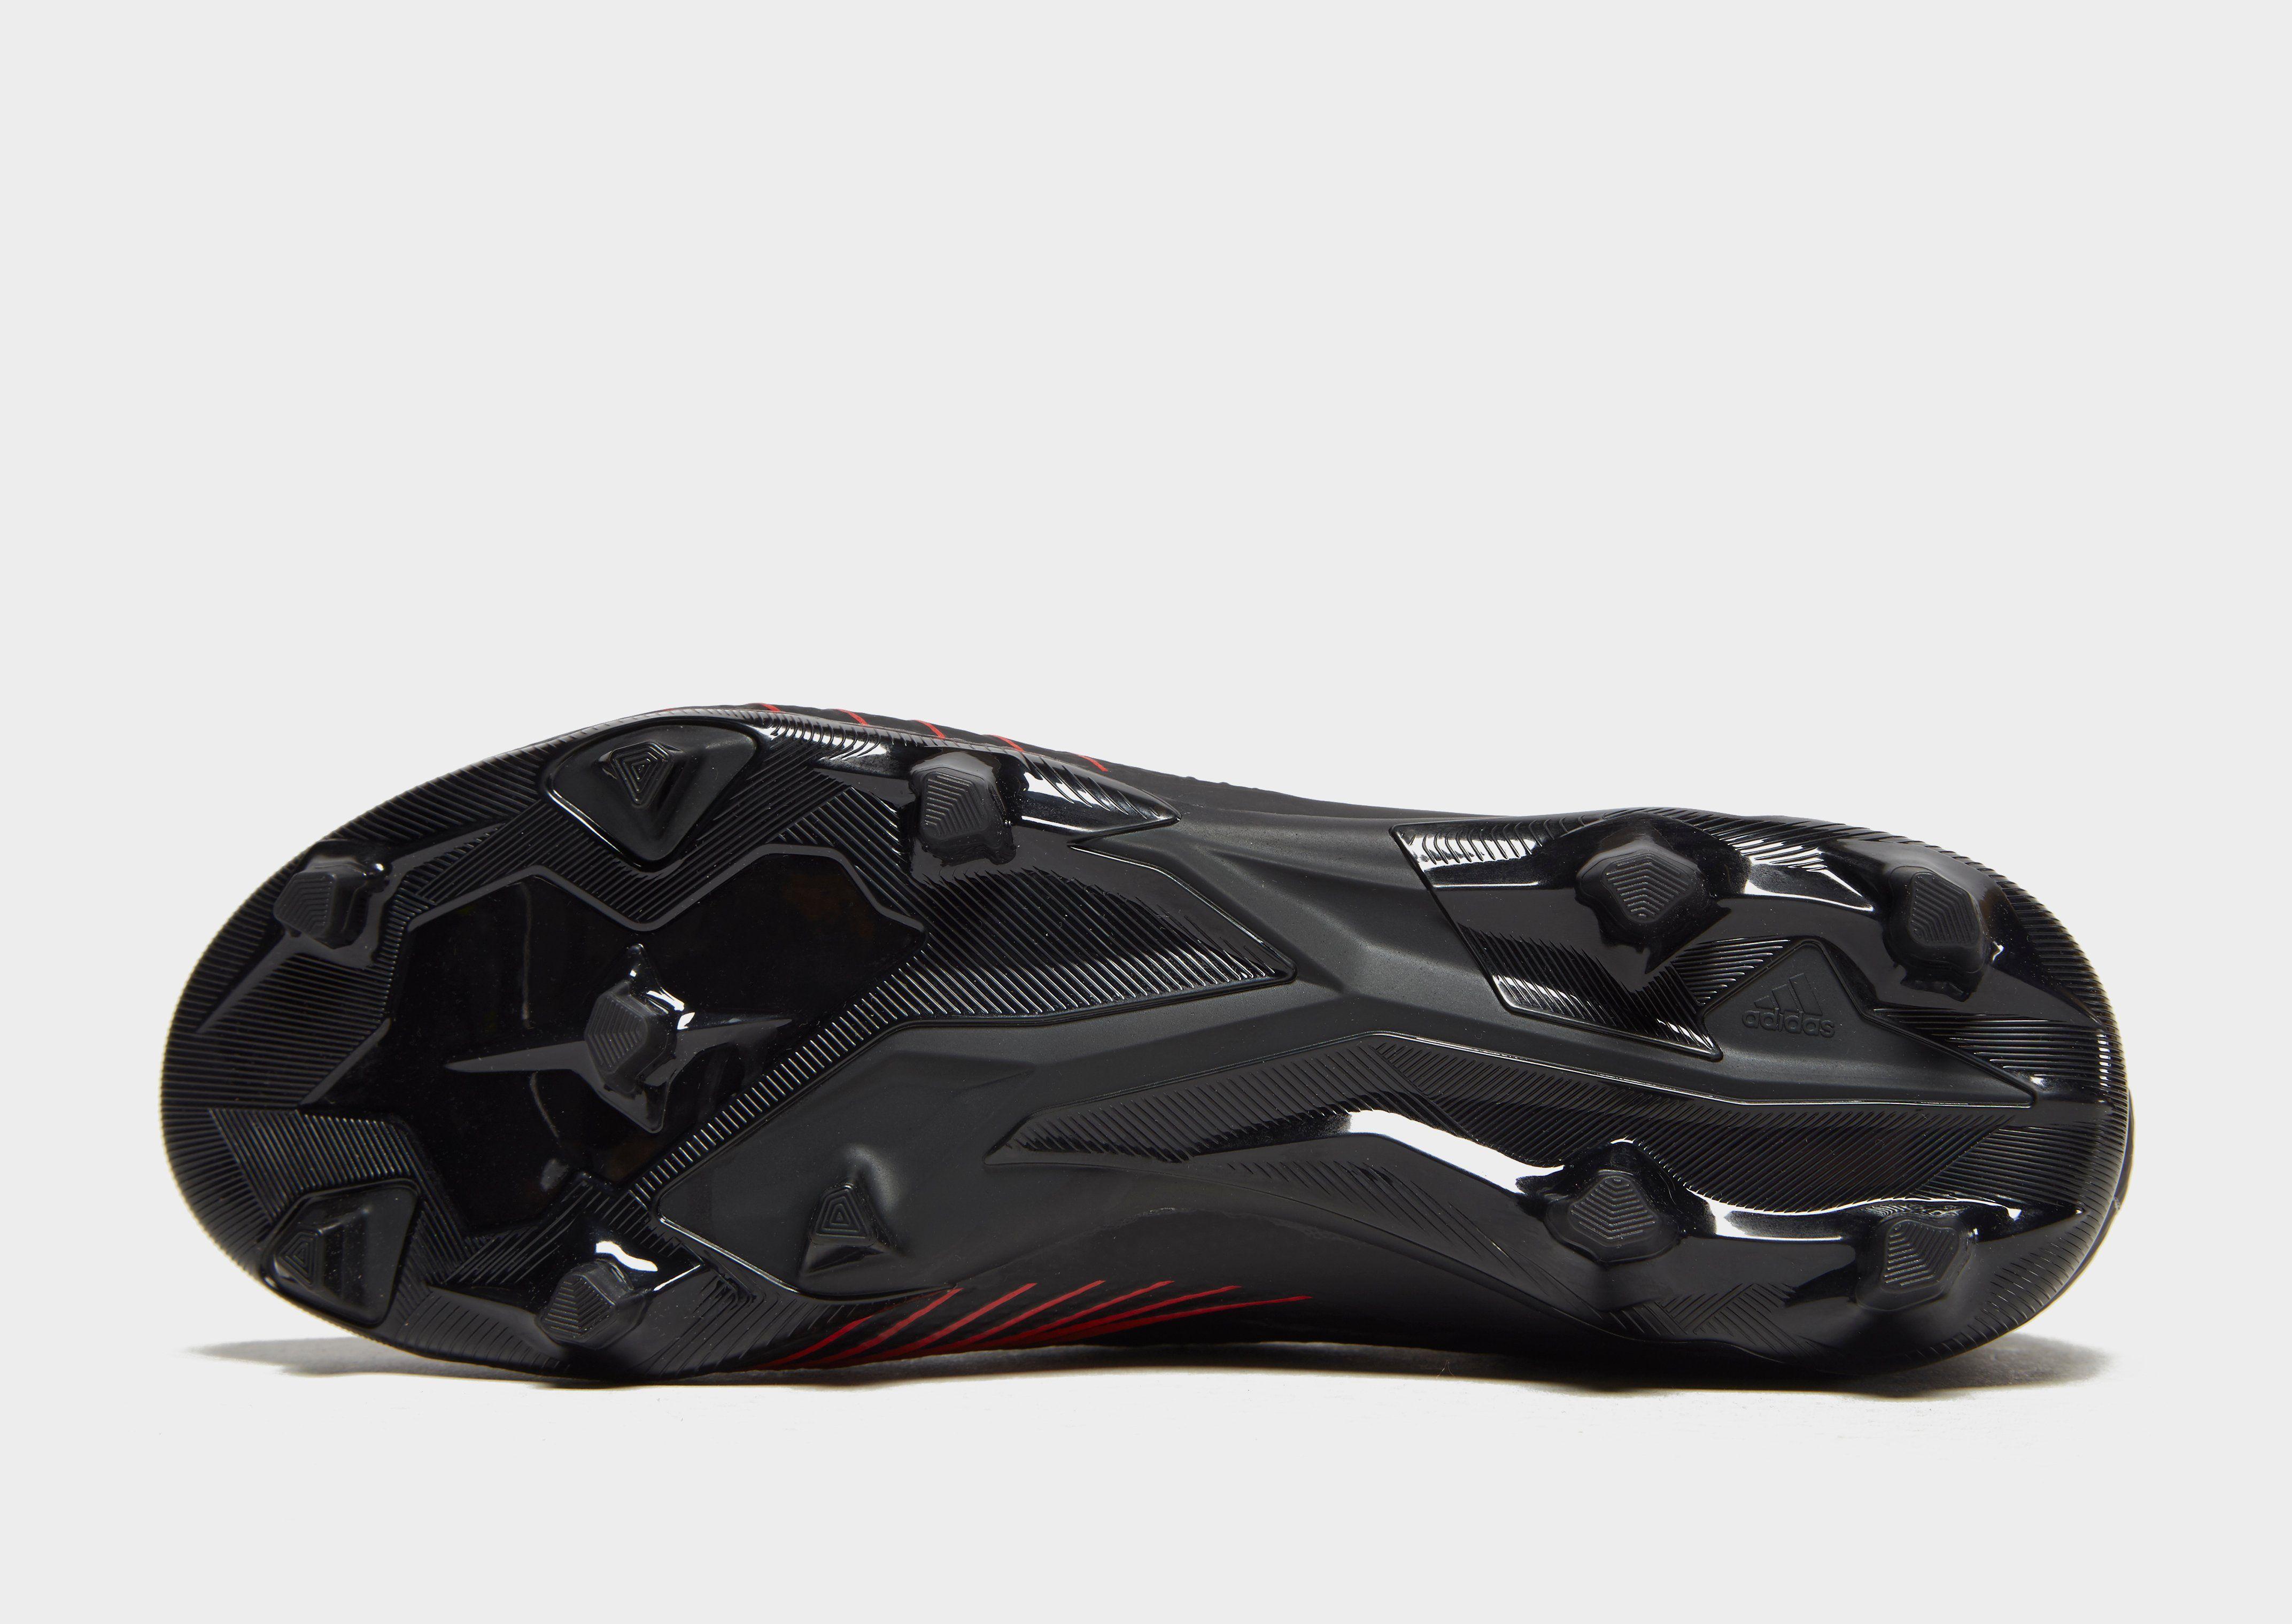 adidas Archetic Predator 19.2 FG